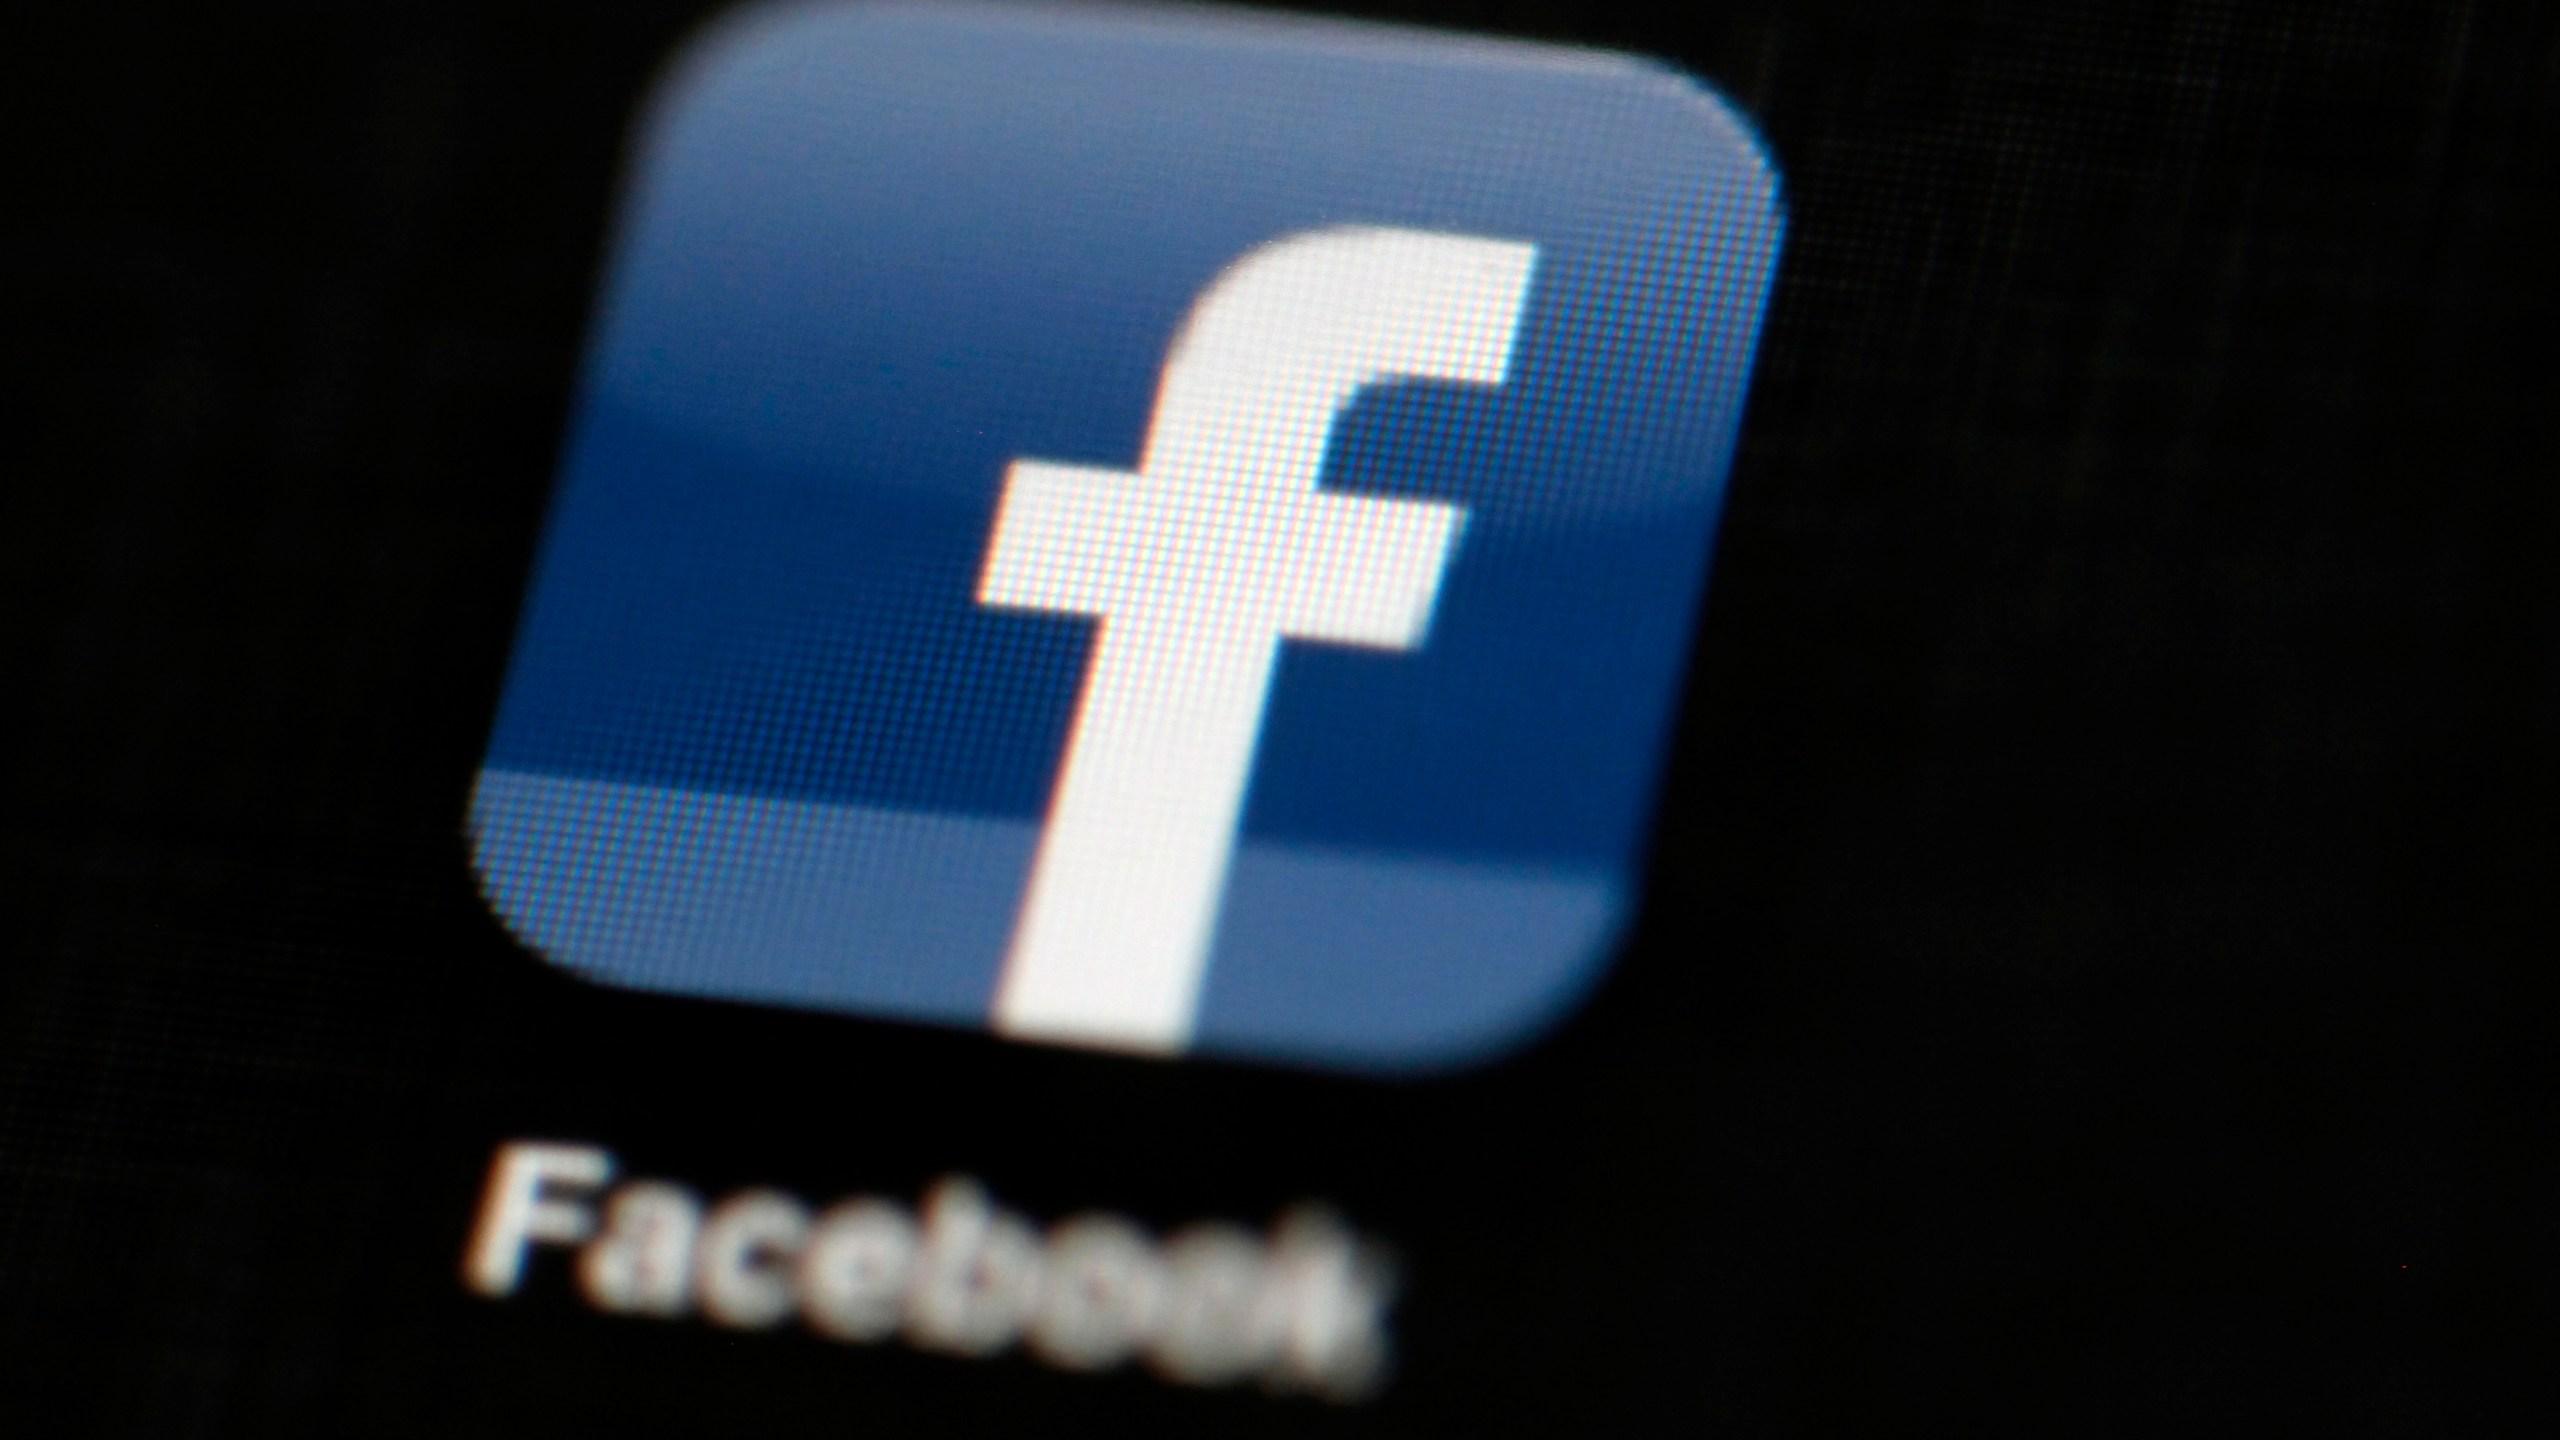 Facebook_Privacy_Scandal_87803-159532.jpg93745624